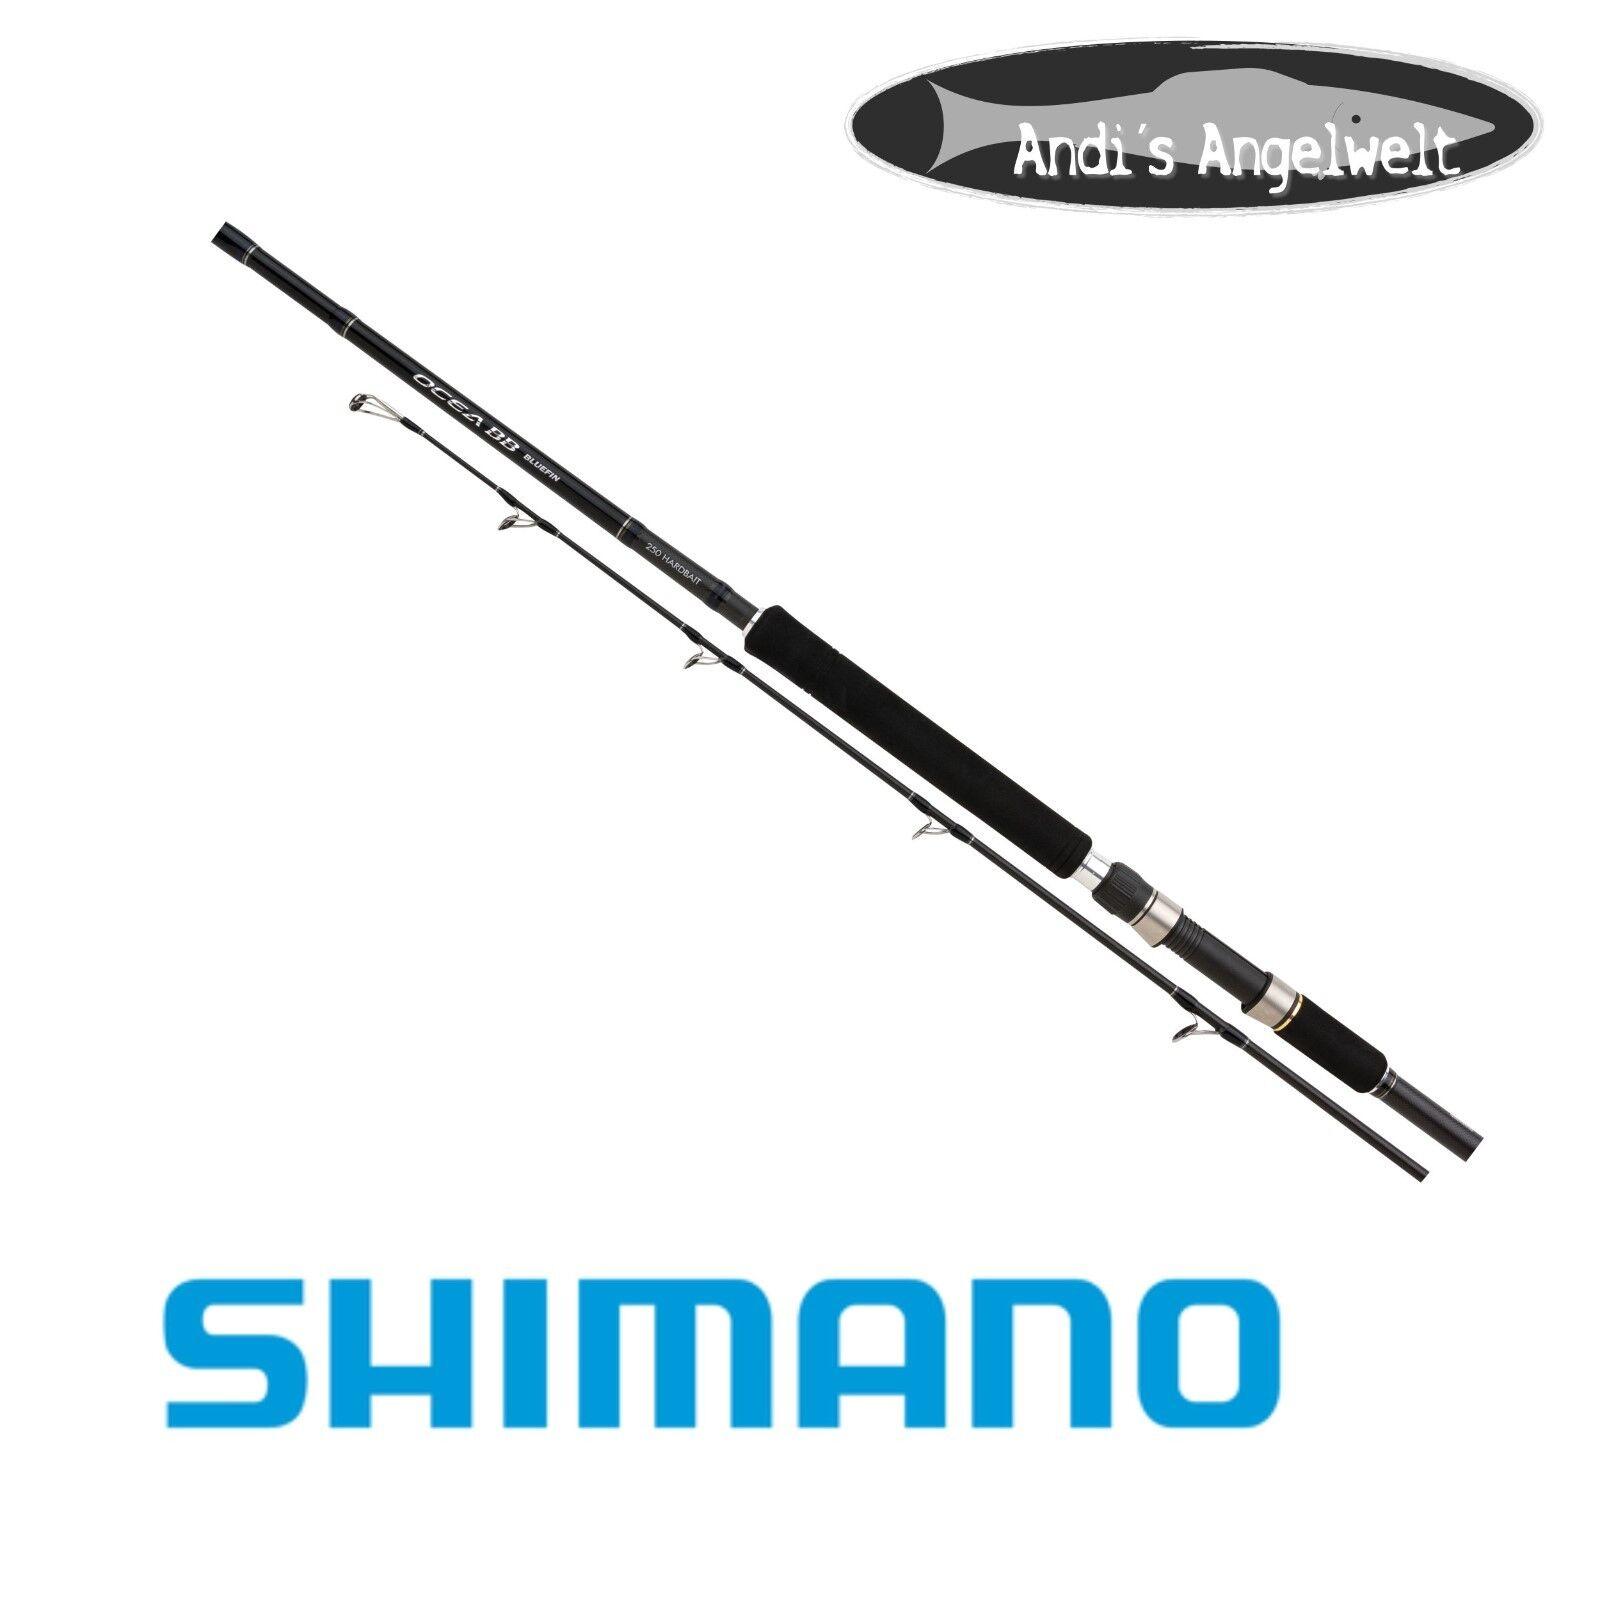 Shimano Ocea spinning BB blufin s79m-mare stadia/40-100g/2,13m